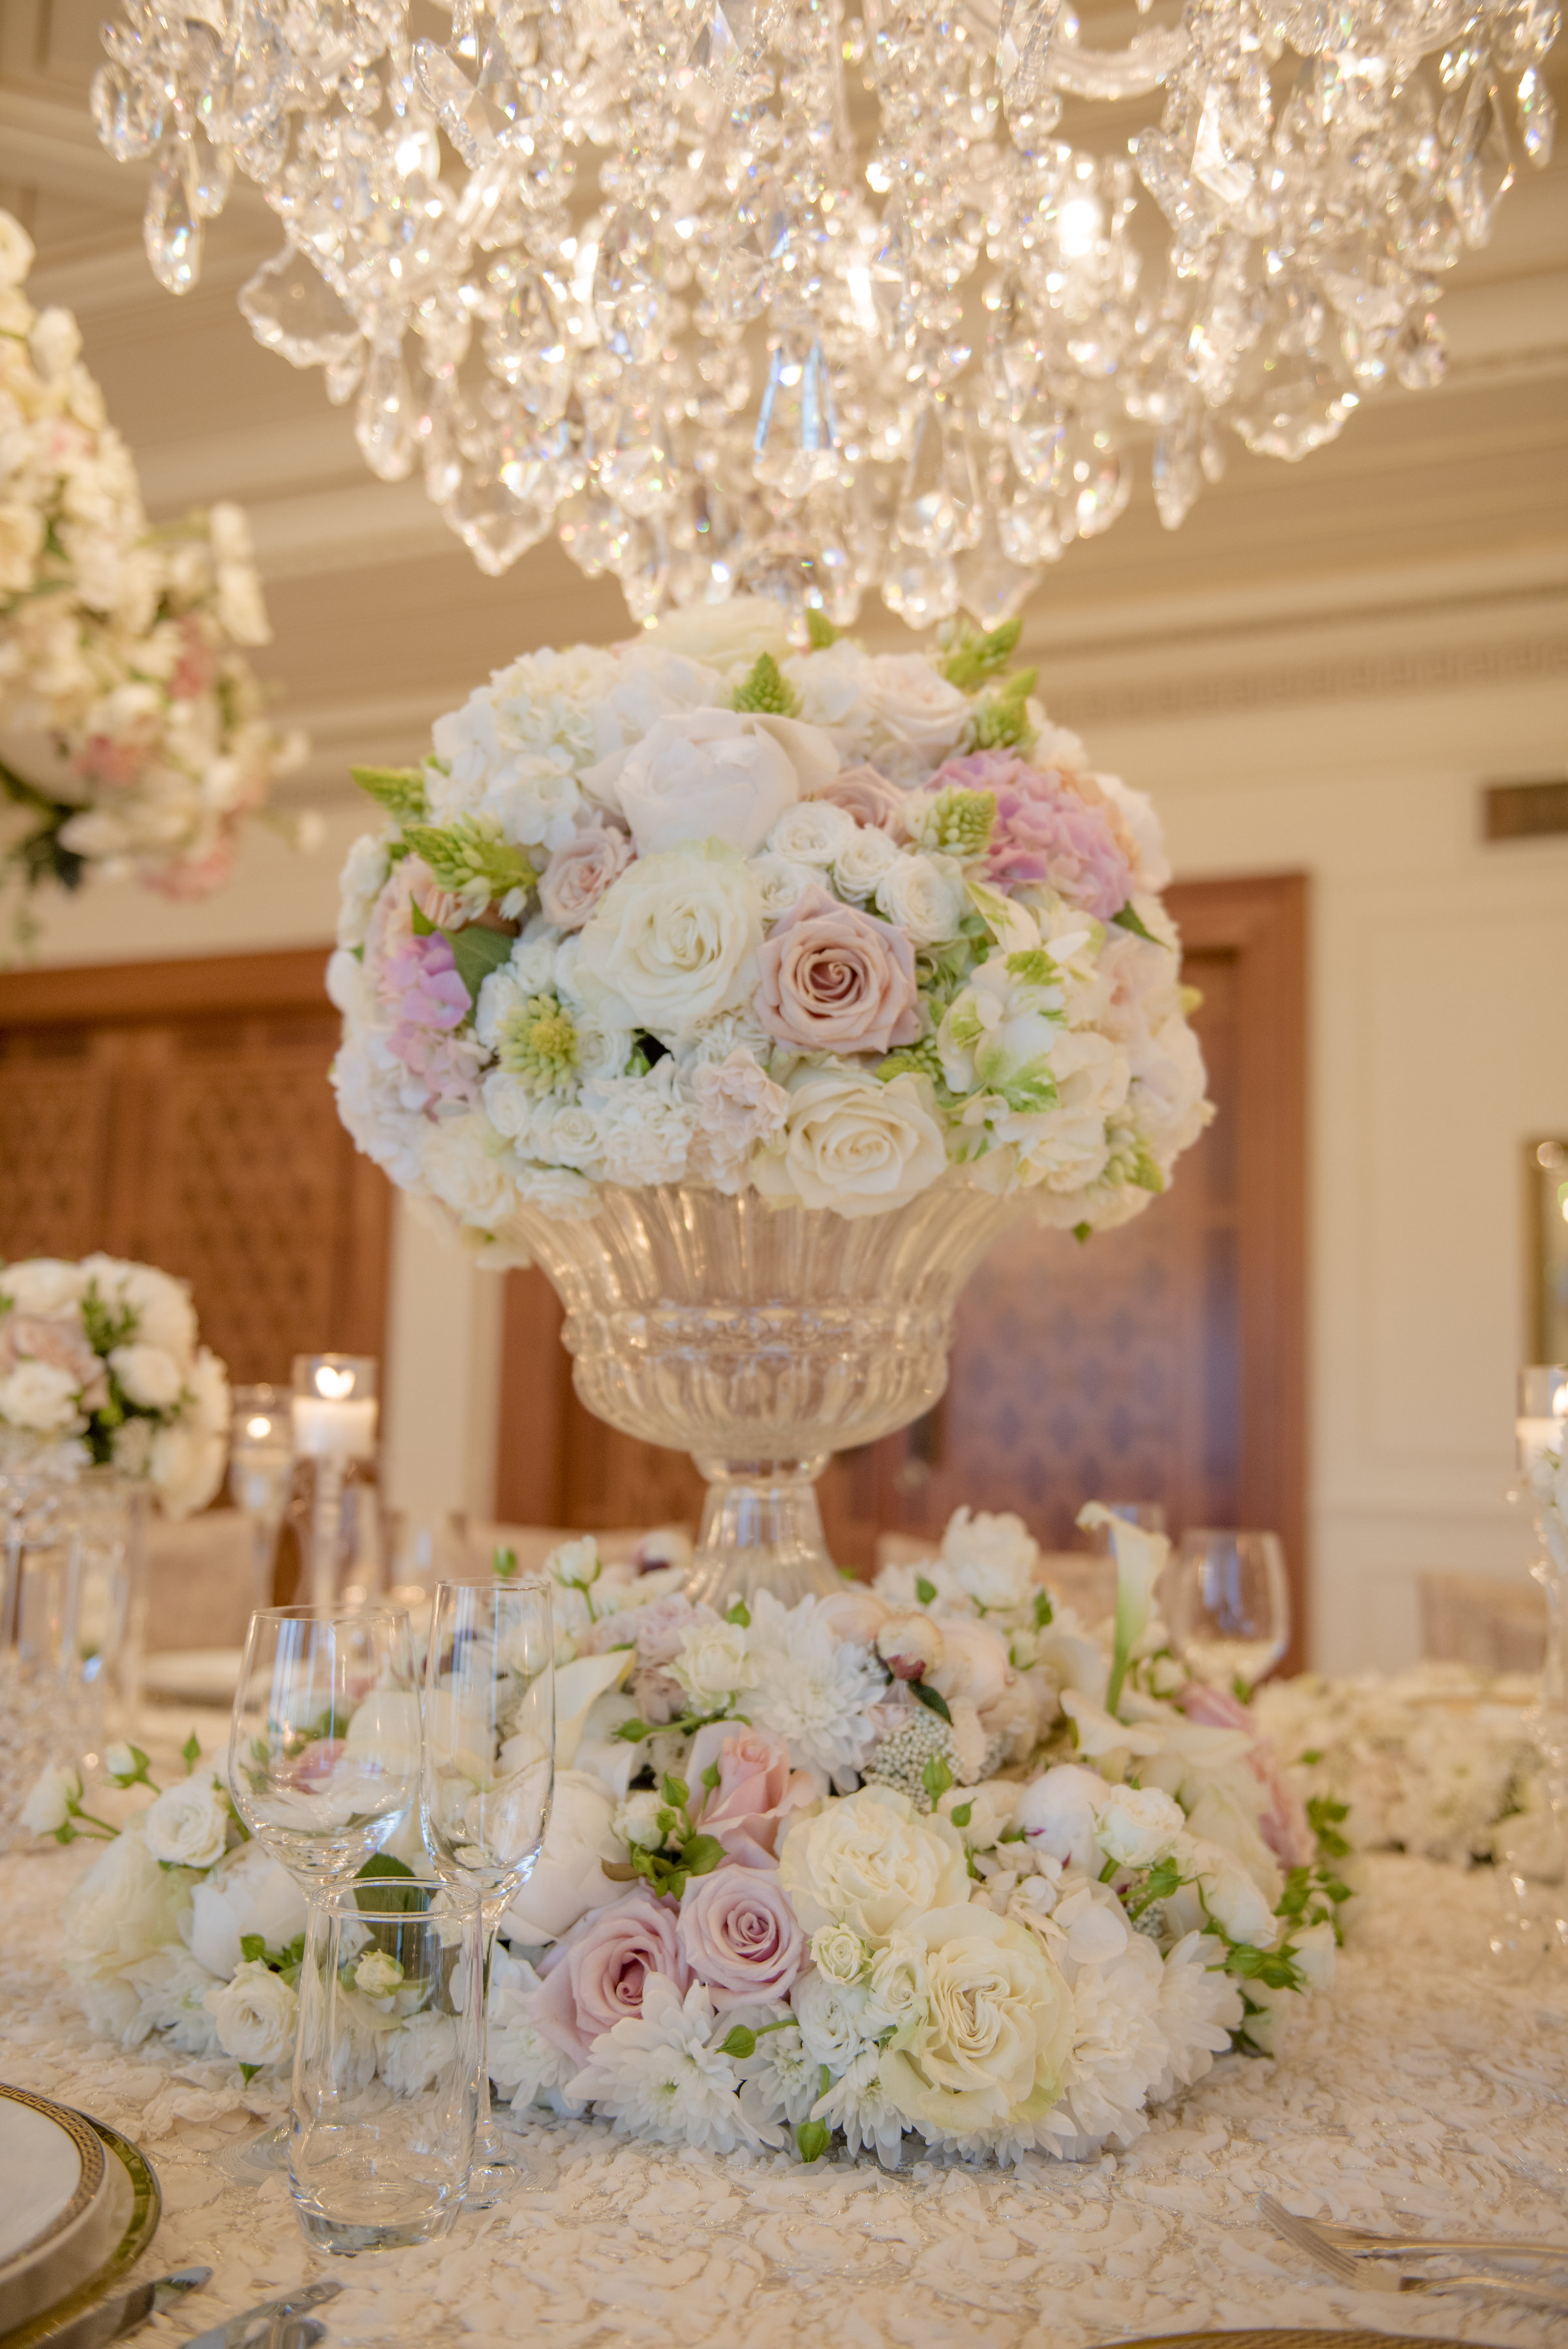 Hire_Ivory_rose_luxury_linen_sydney_wedding_decor_event_Versace_Decor_floral_centrepeice_white_pink_chandelier.jpg